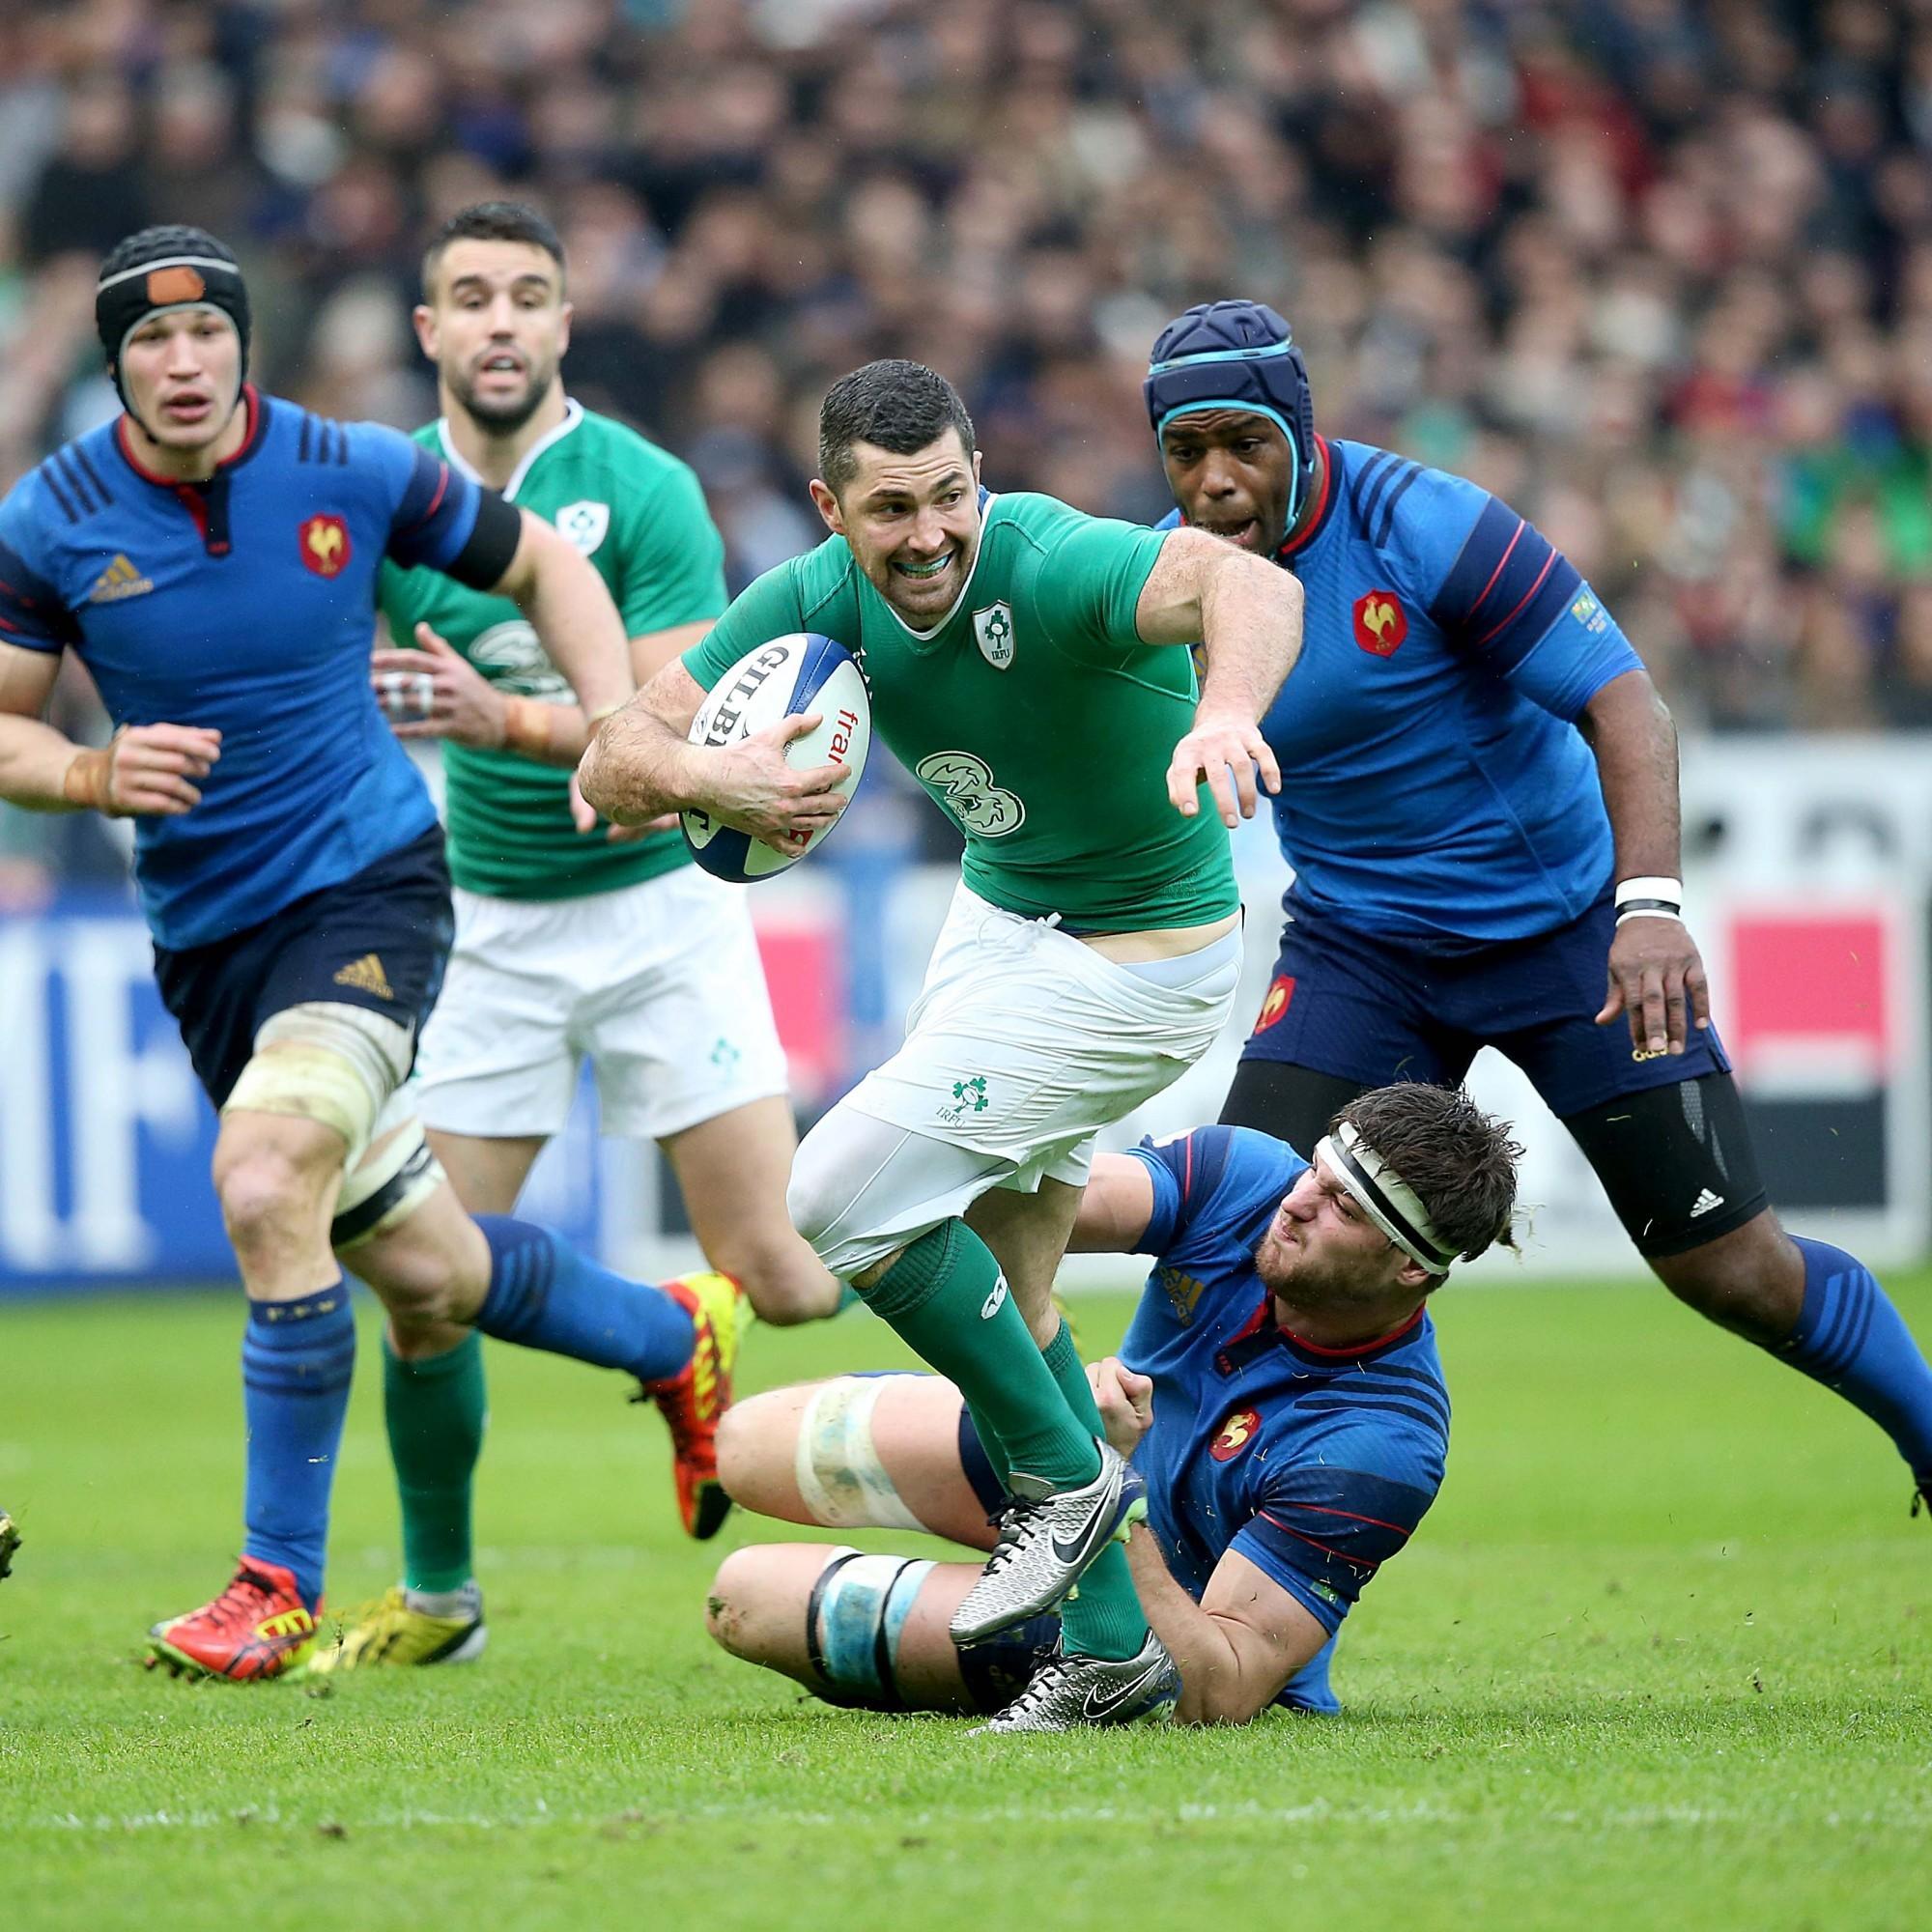 Les Bleus edge brutal Parisian battle with Schmidt's beaten Ireland